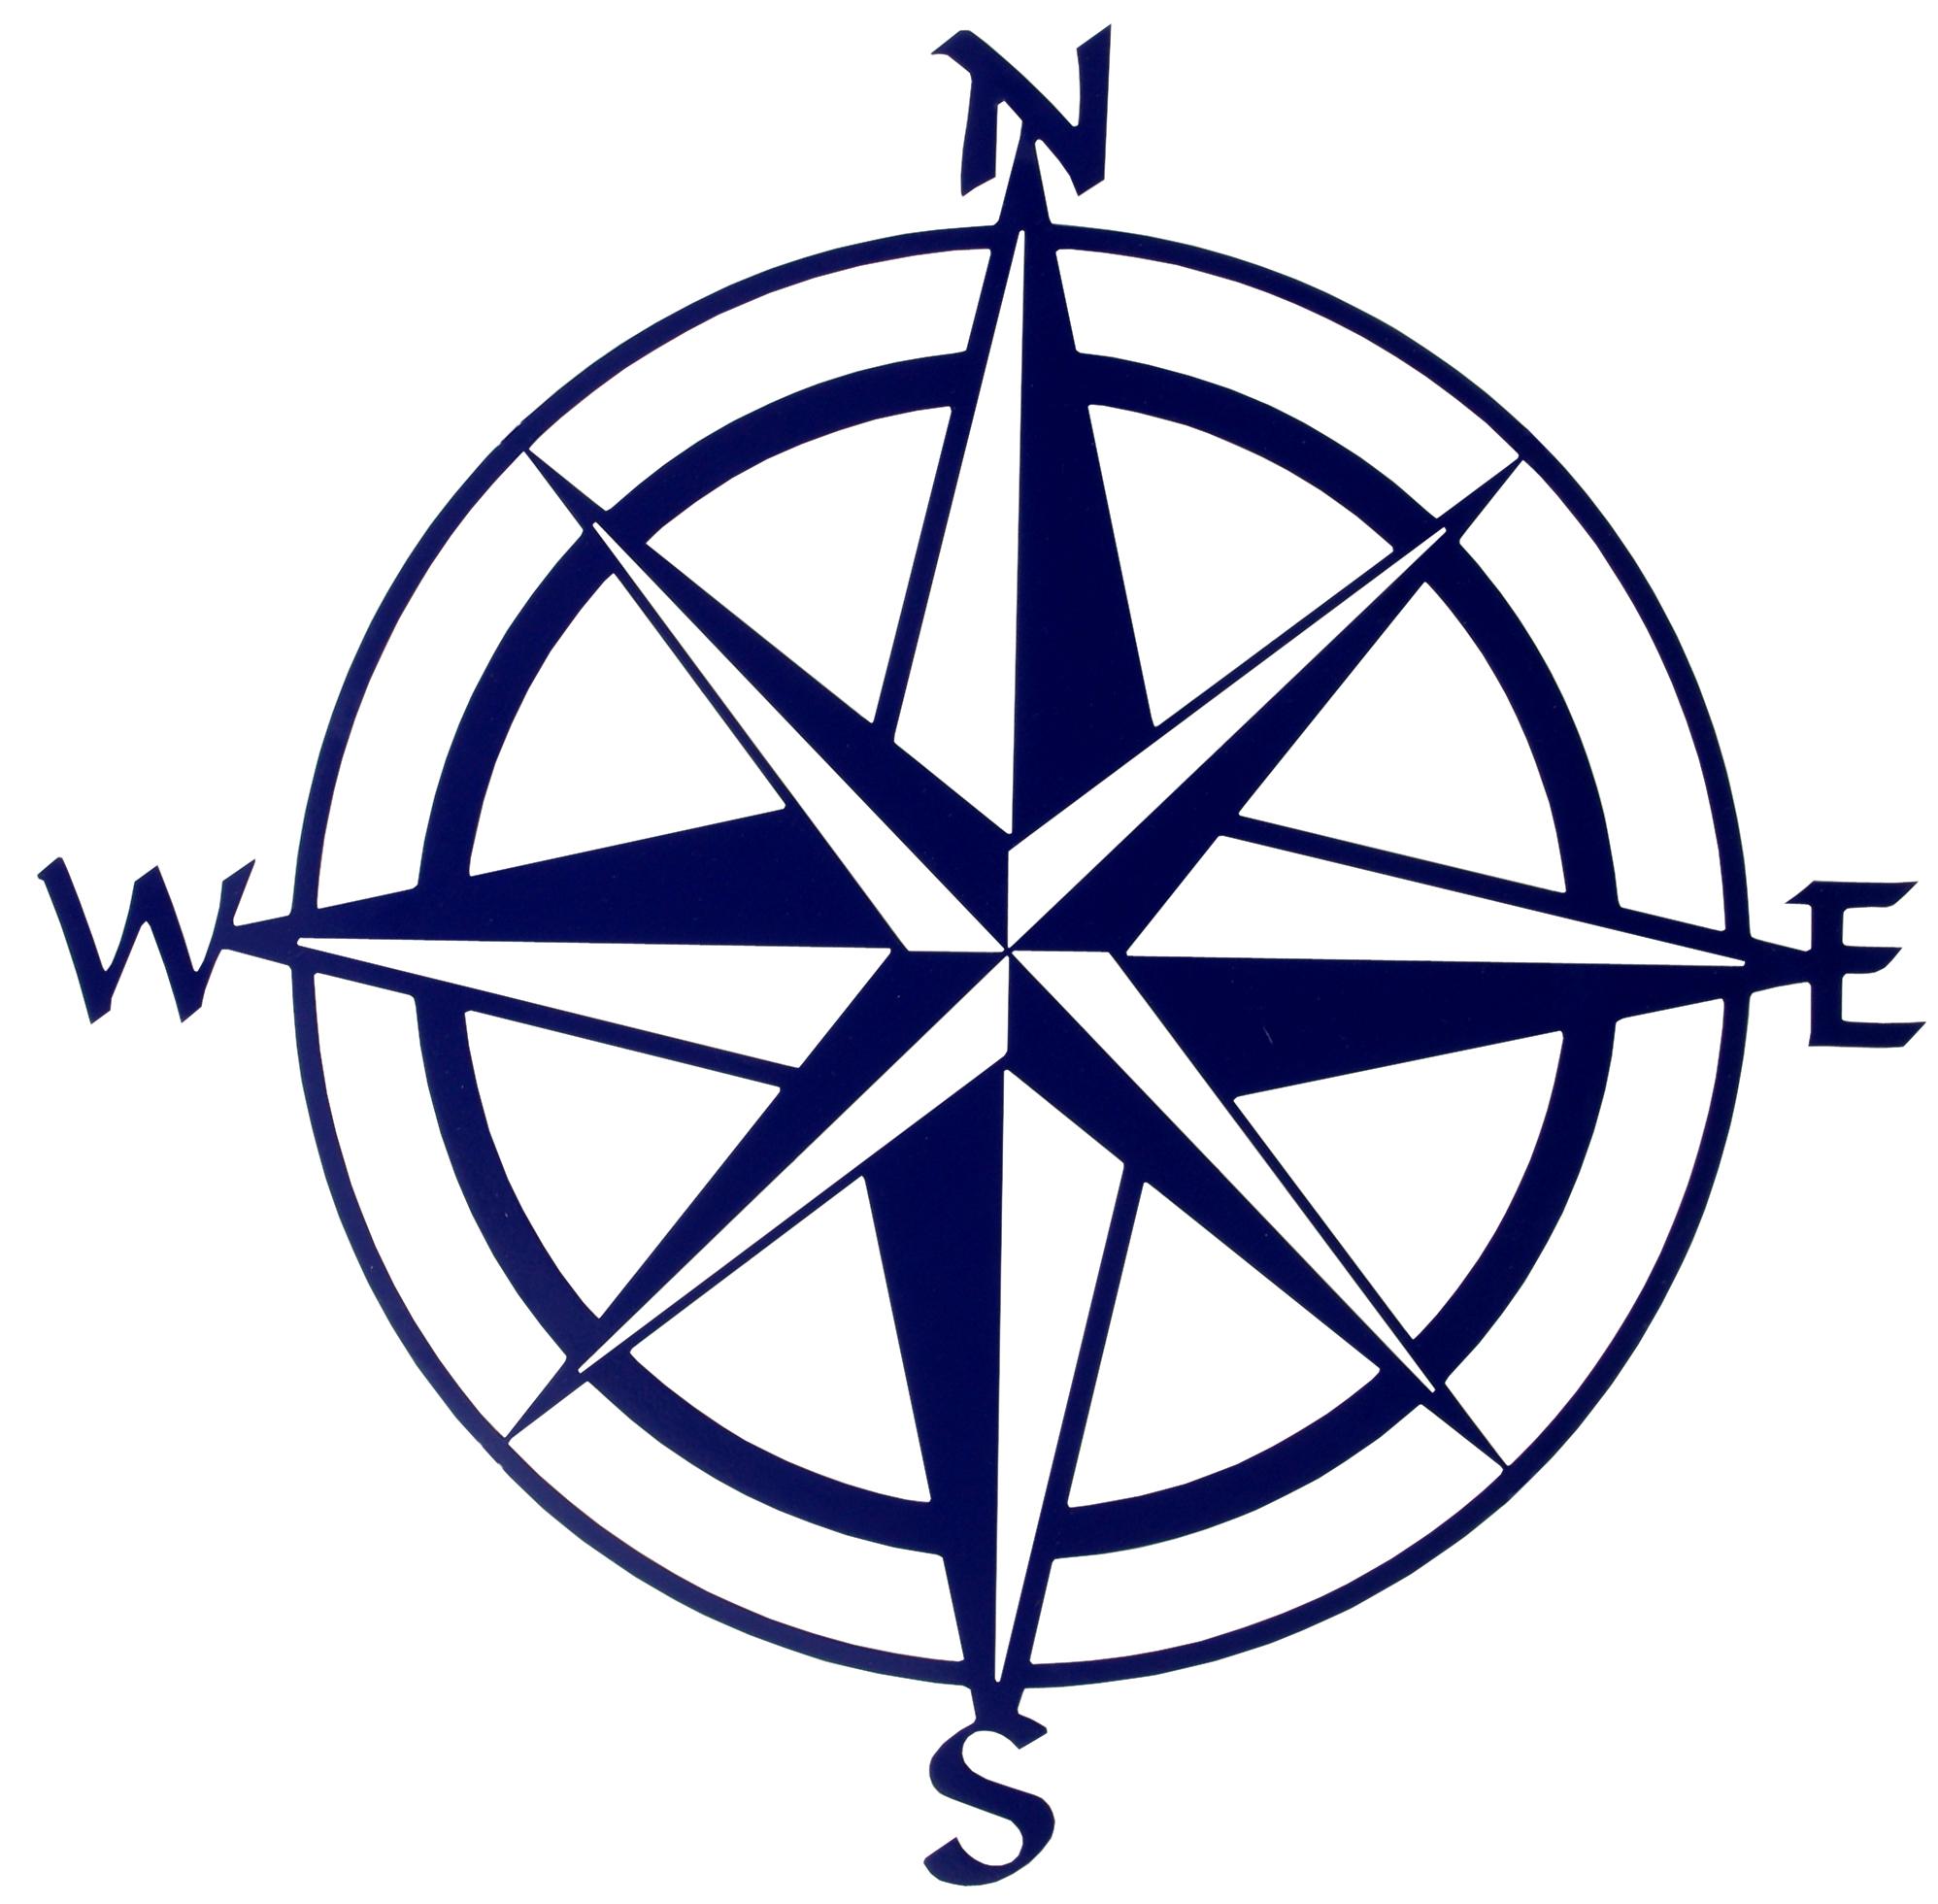 Compass North - ClipArt Best (1996 x 1961 Pixel)